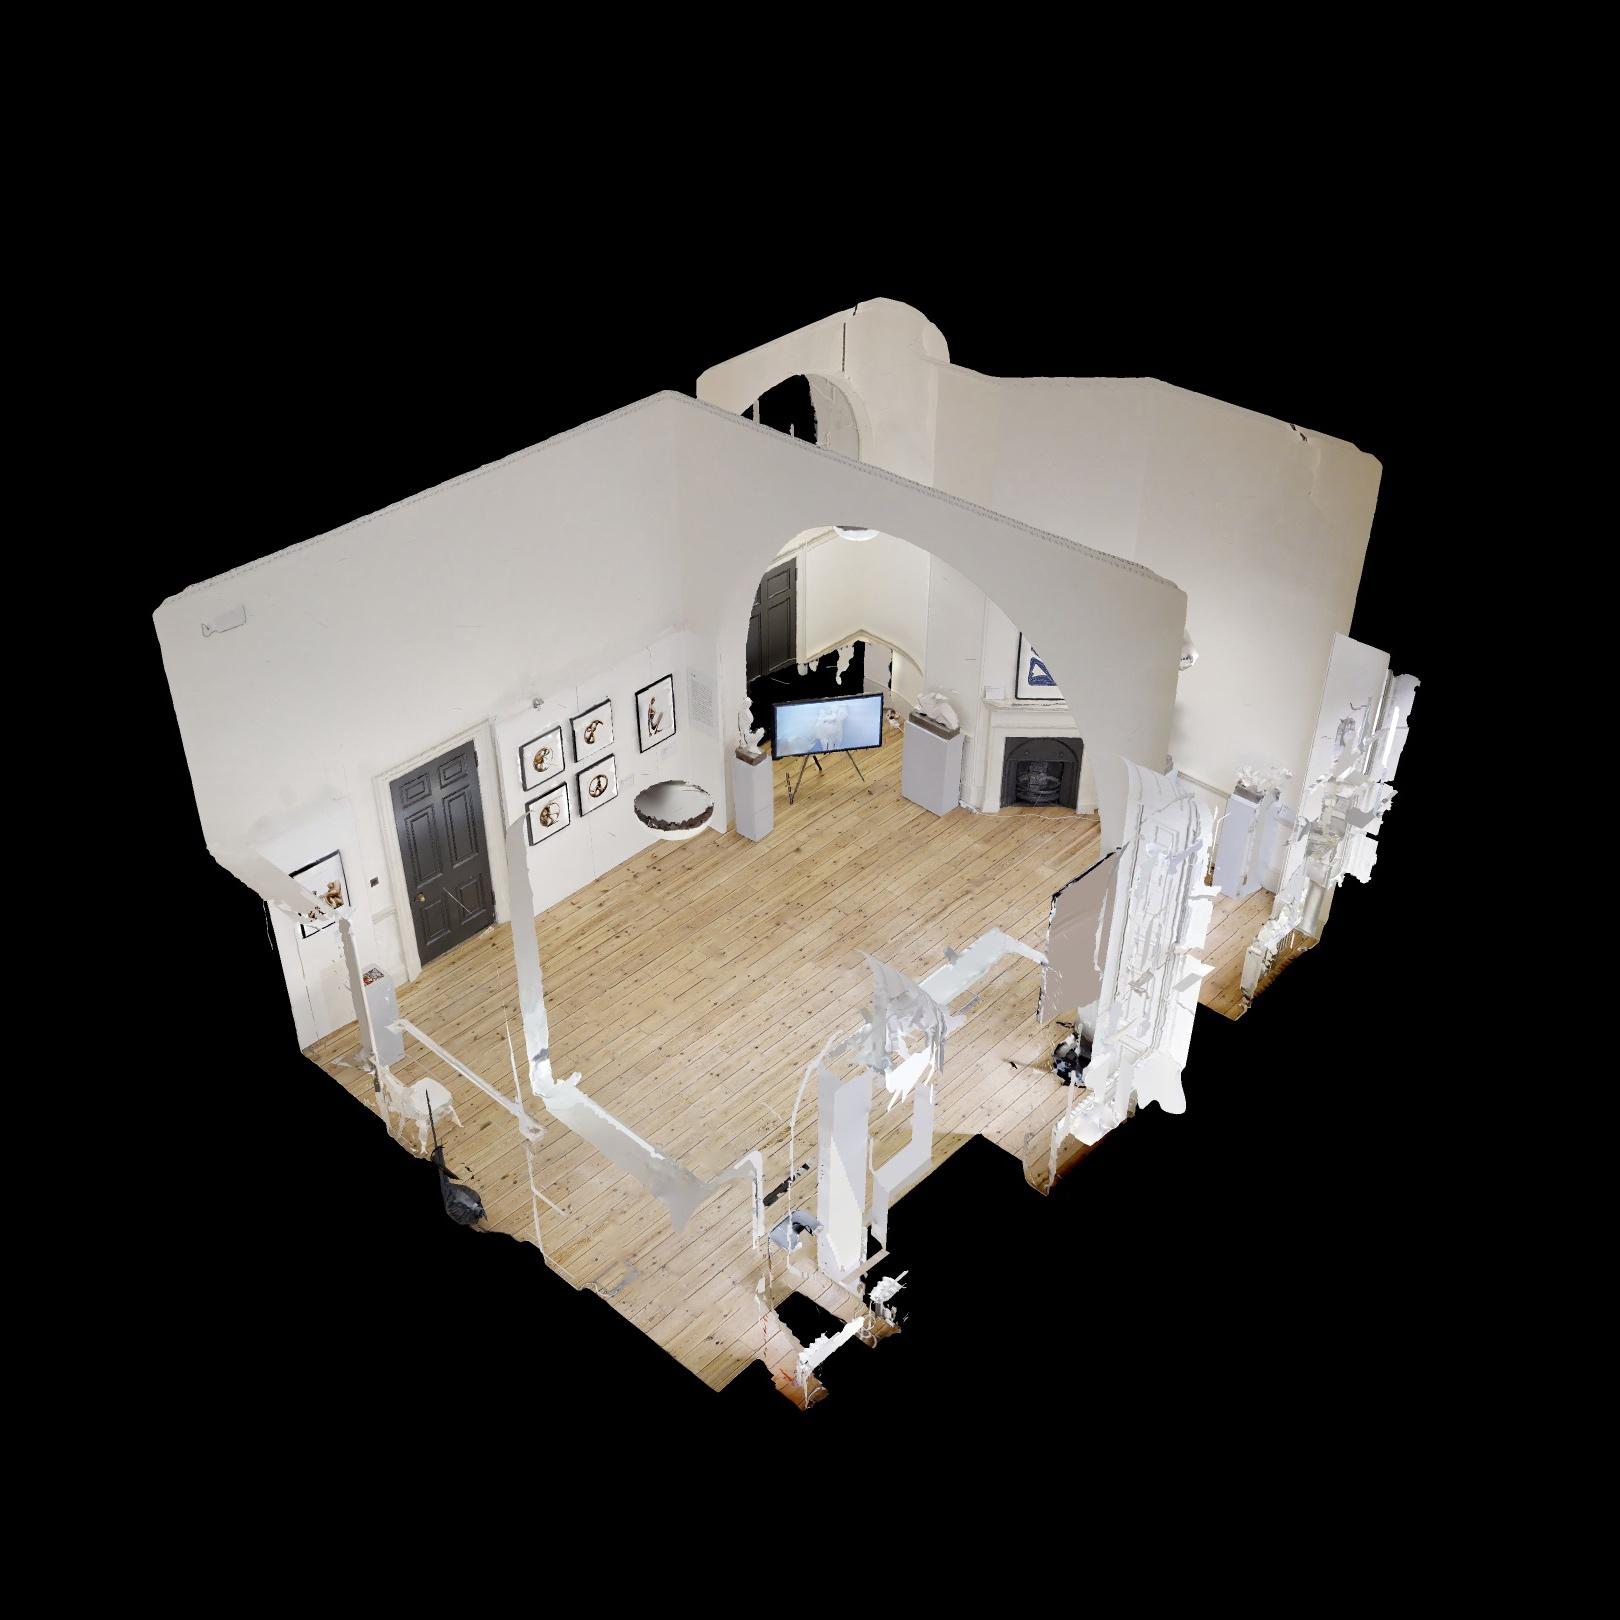 Scott-Eatons-ArtistAi-Figures-Form-Dollhouse-View.jpg